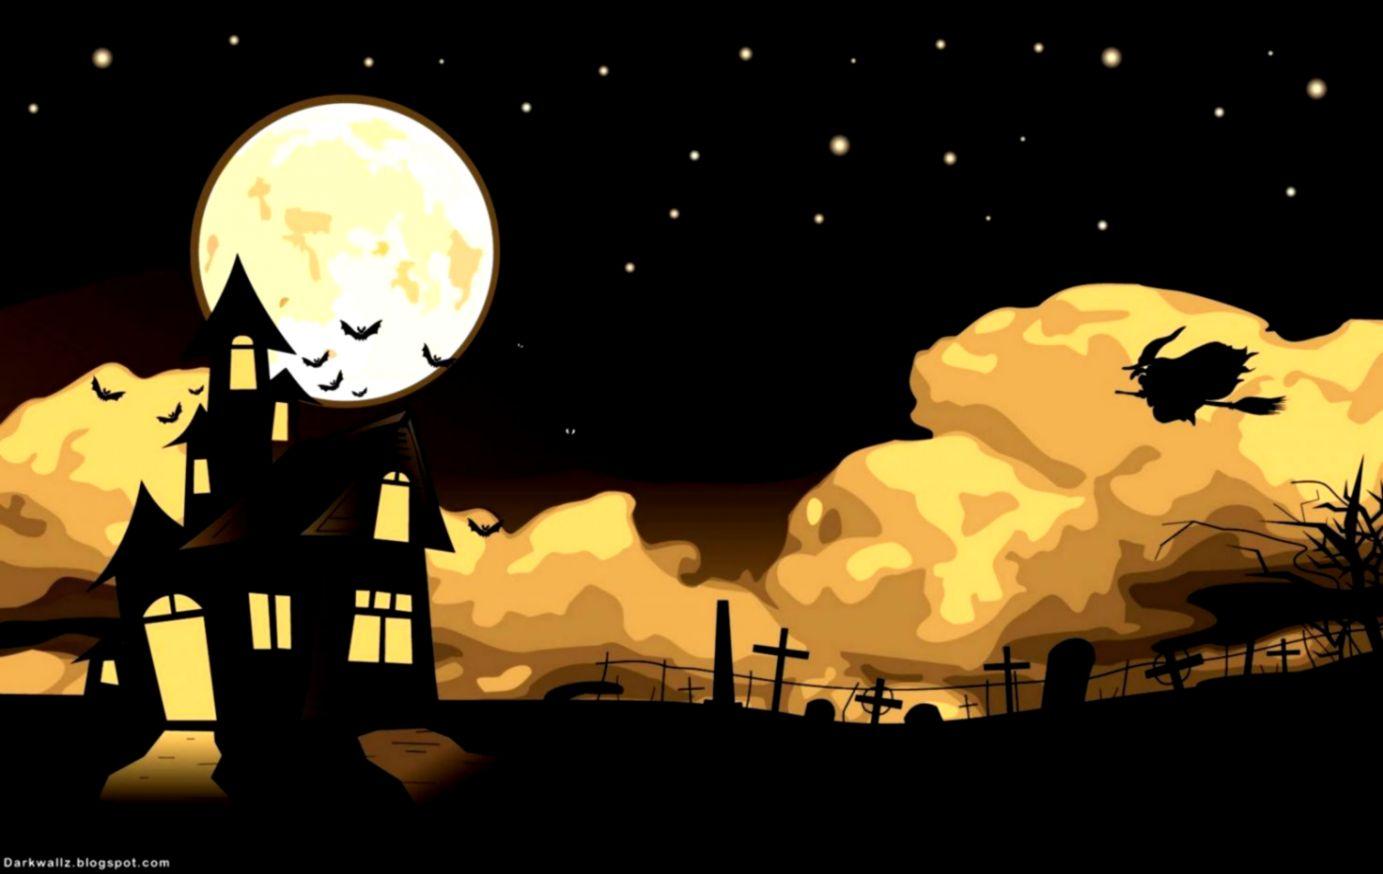 35 Free Halloween Backgrounds Hd For Desktop Iphone Halloween Desktop Backgrounds 1383x874 Wallpaper Teahub Io